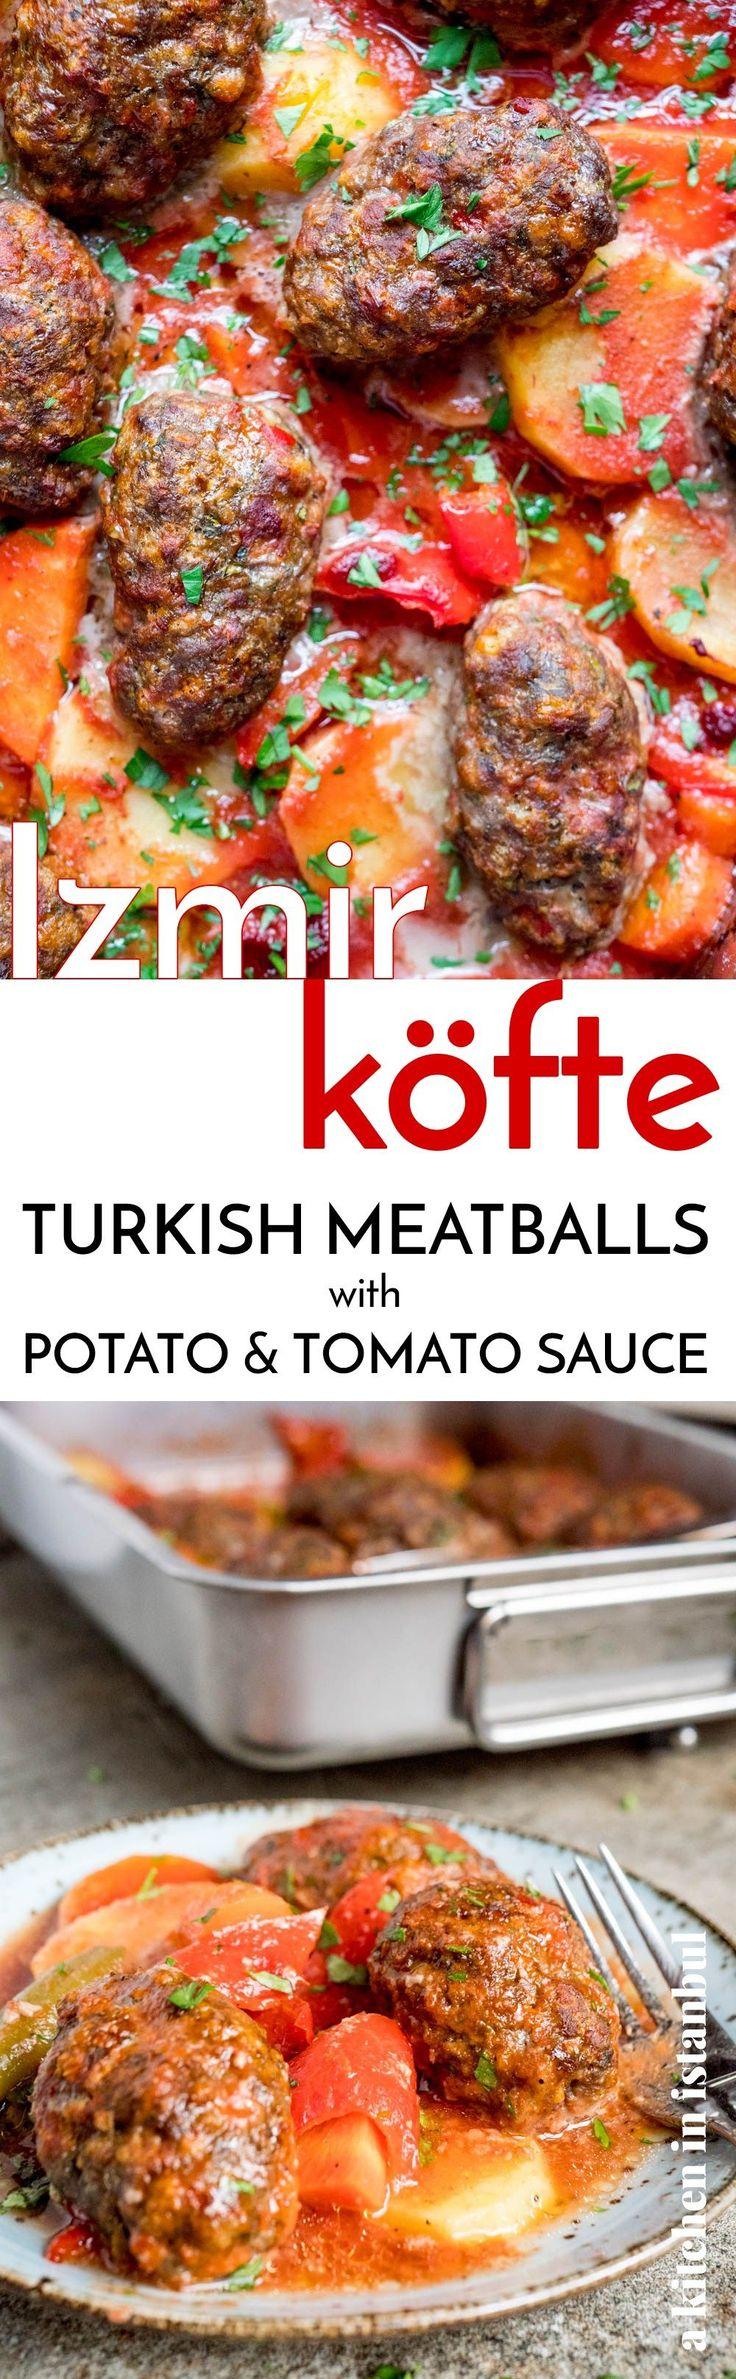 İzmir köfte (Turkish meatballs with potato and tomato sauce) - recipe / A kitchen in Istanbul